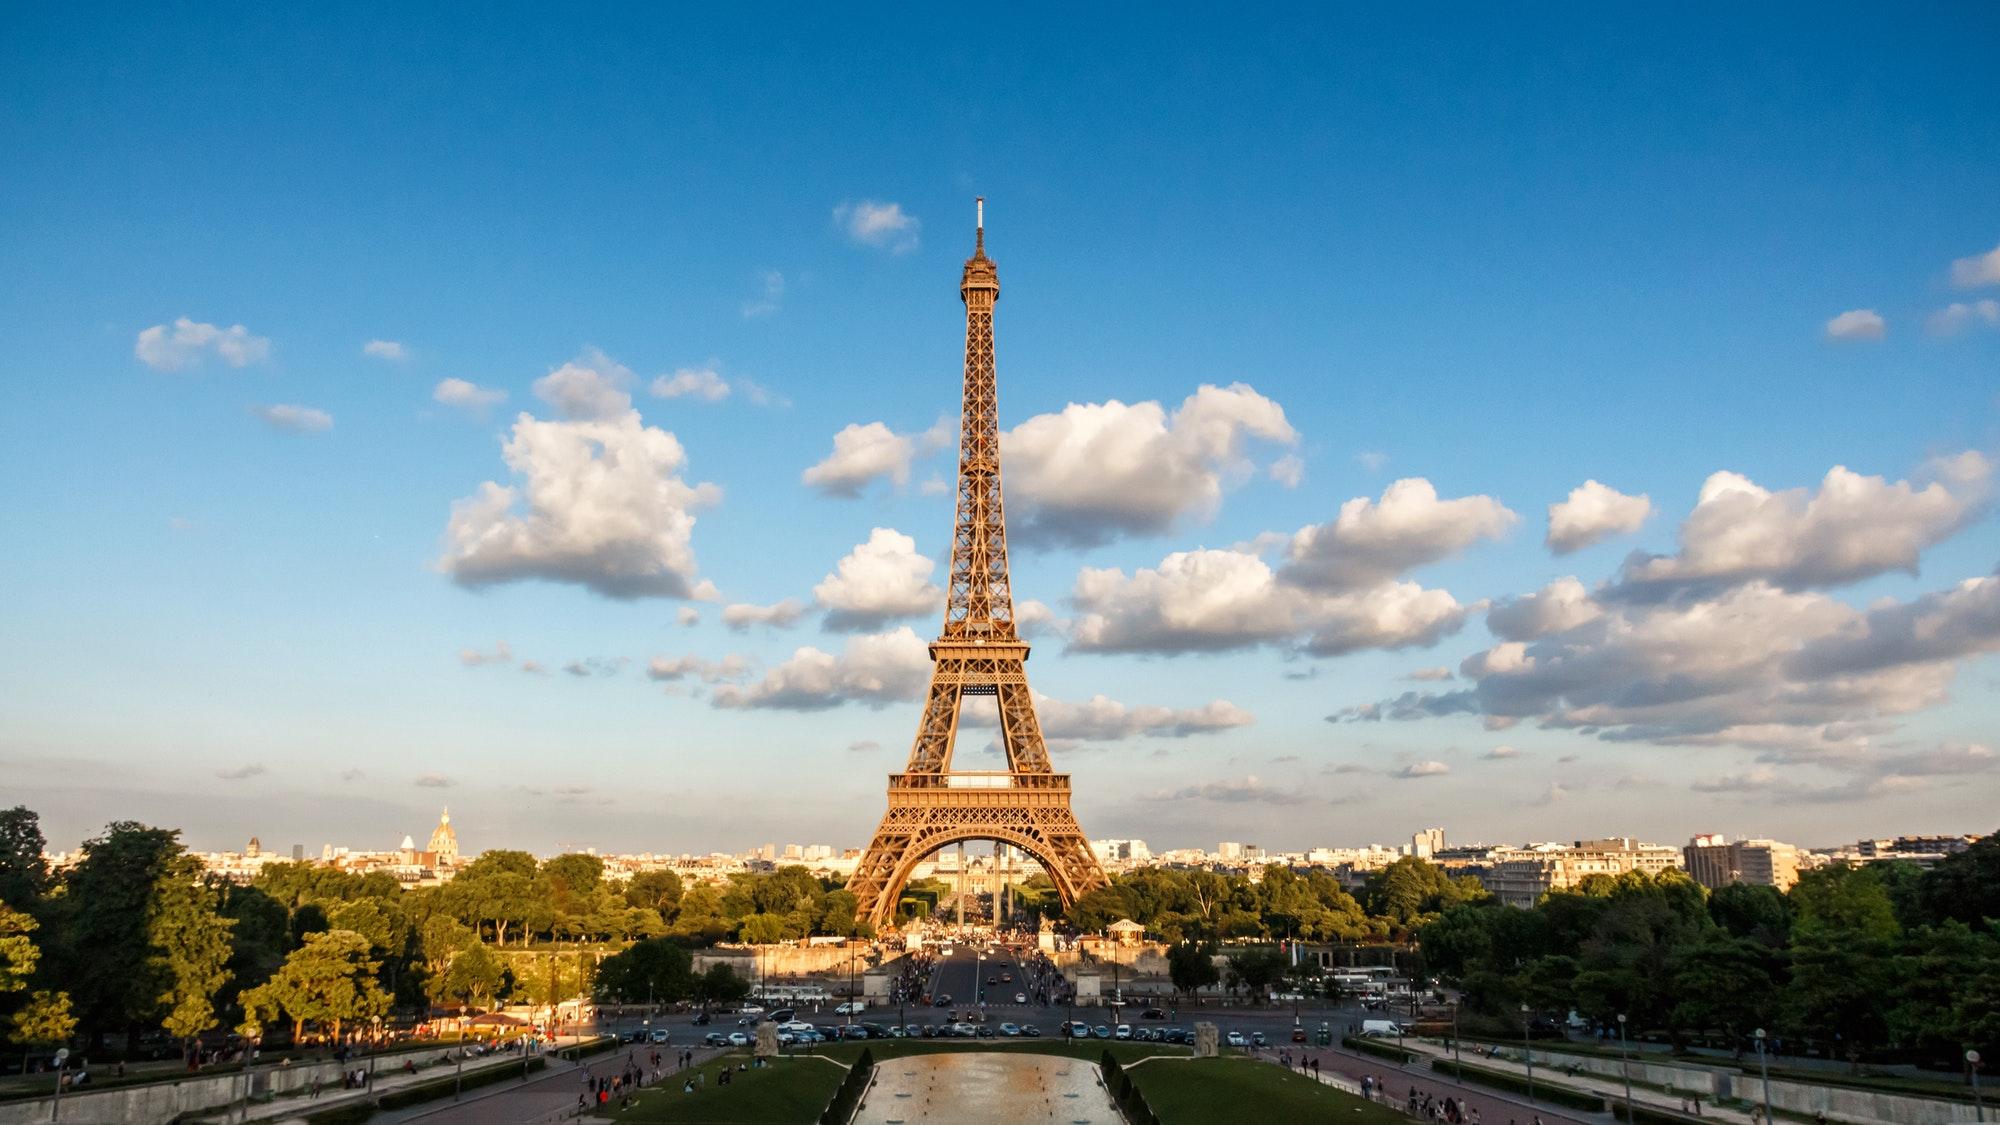 The Eiffel Tower, landmark of Paris, France